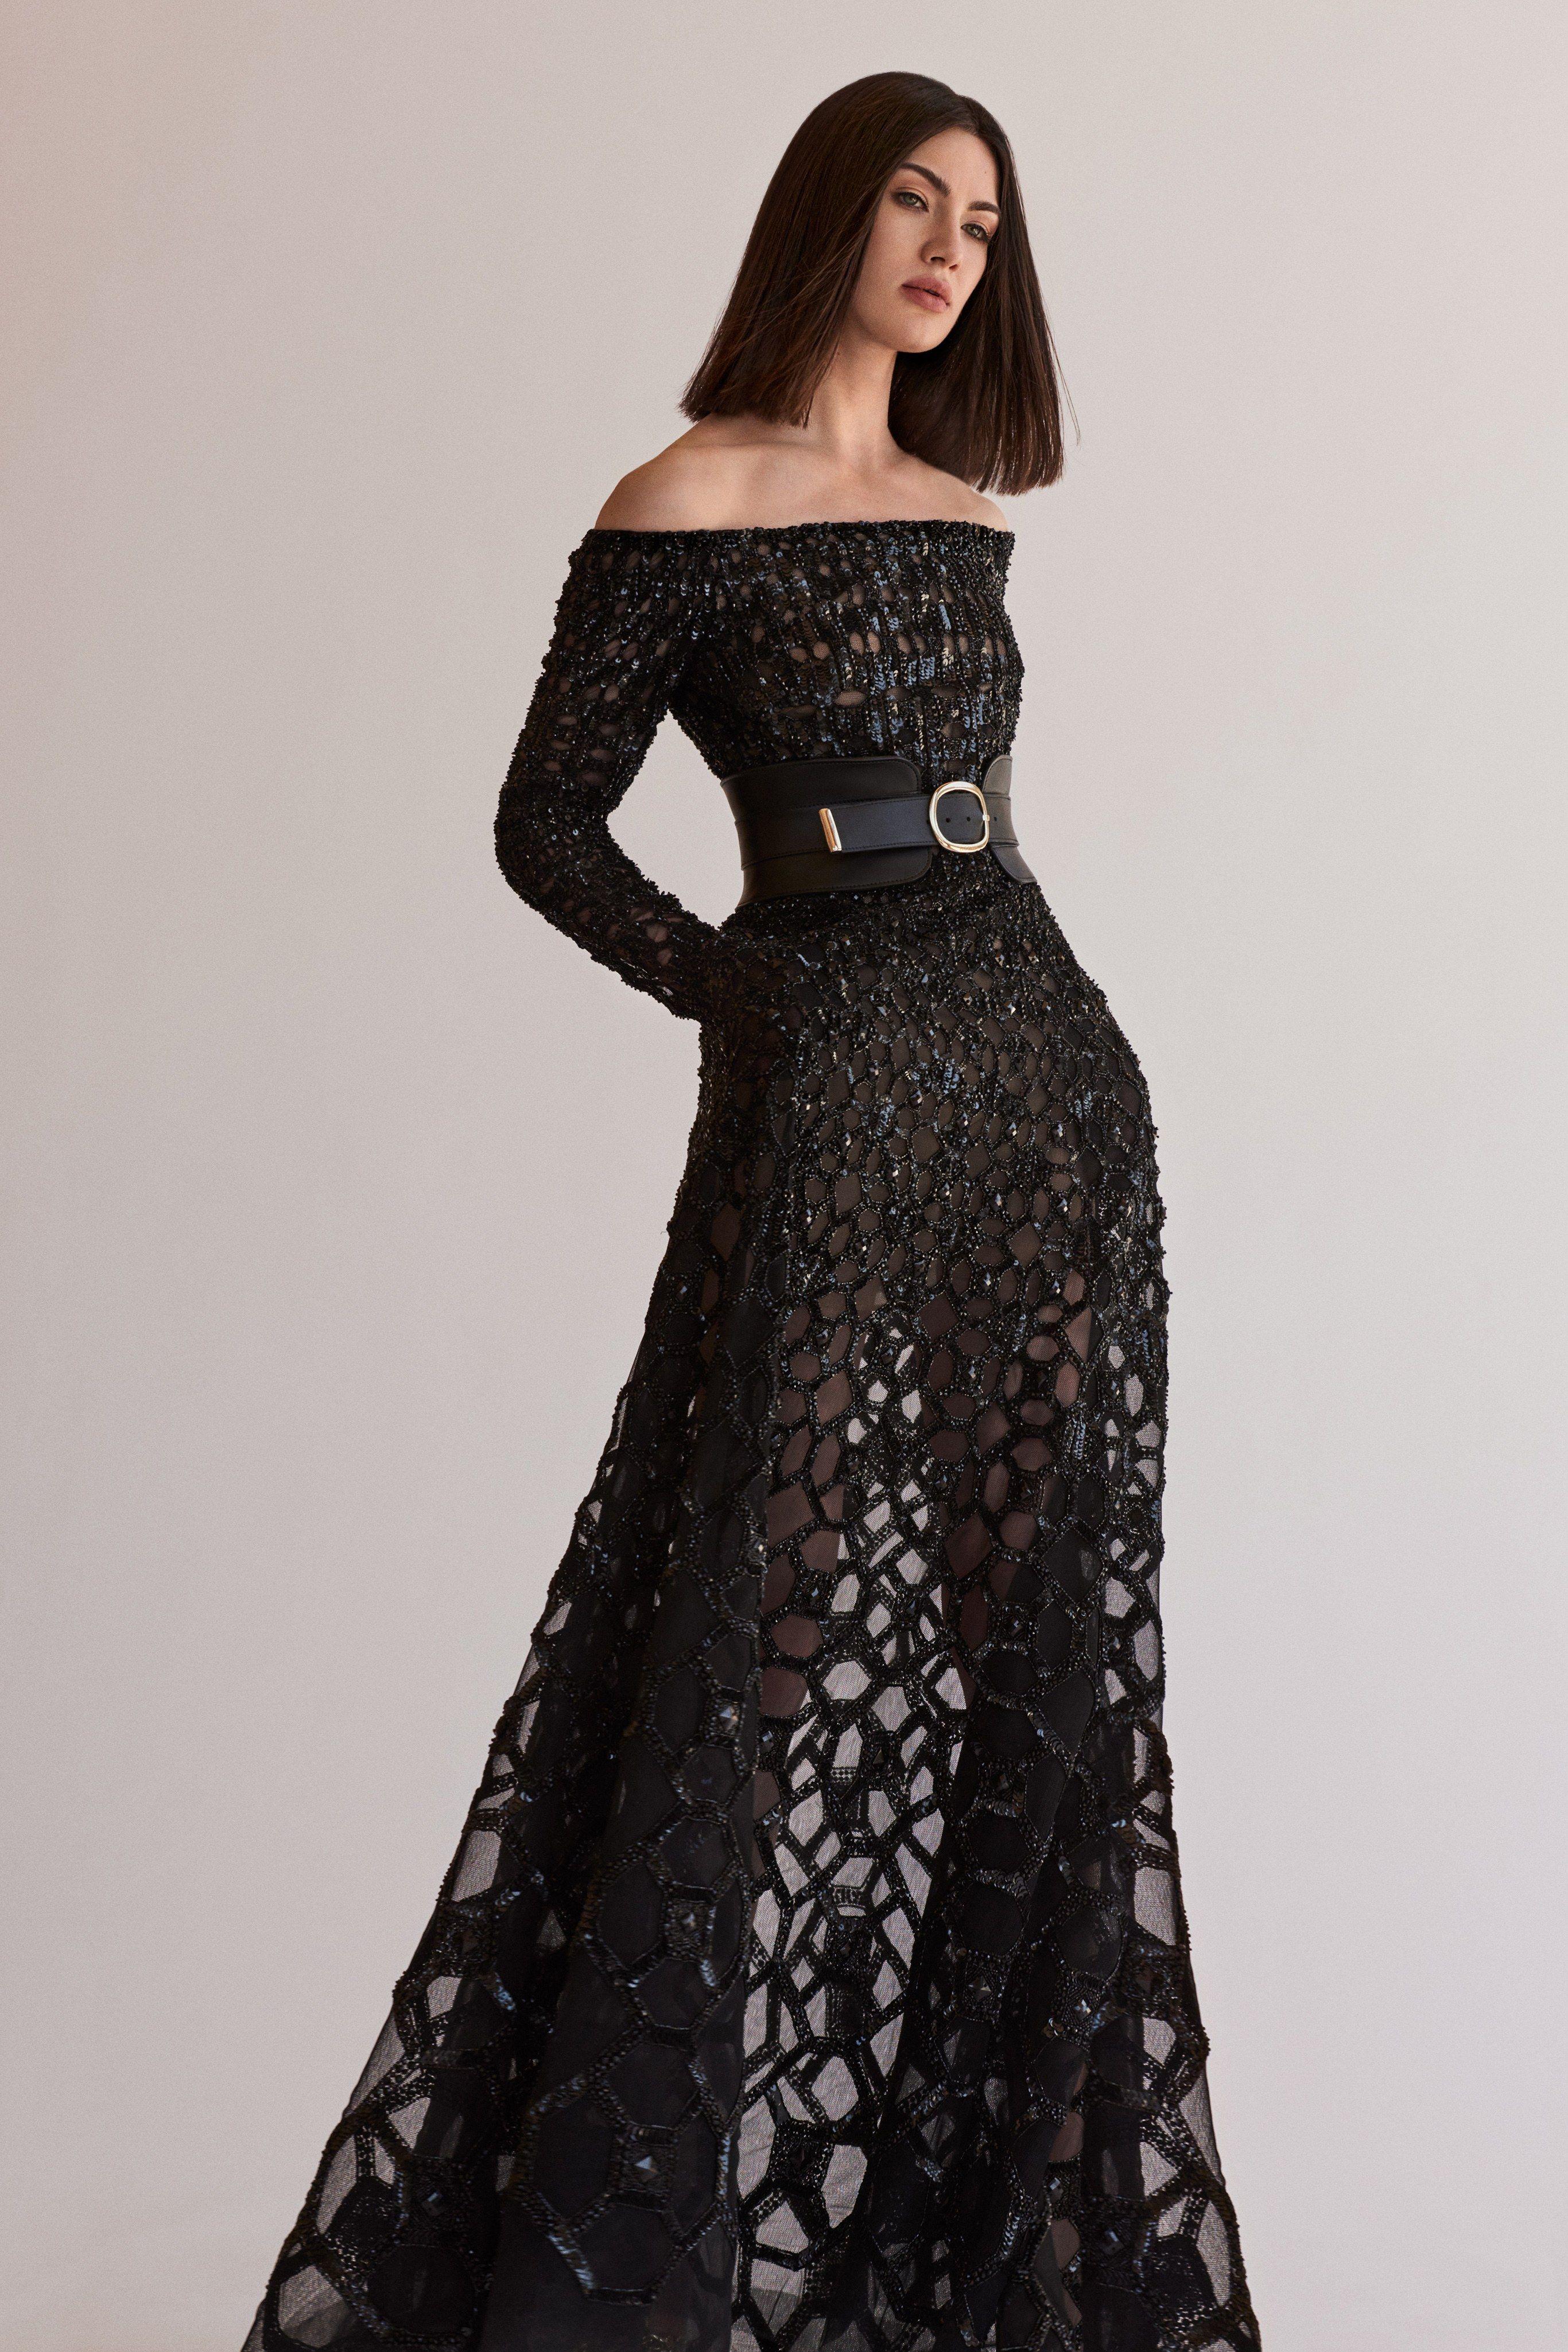 Elie Saab Resort 2020 Fashion Show Couture Evening Dress Elie Saab Gowns Black Evening Dresses